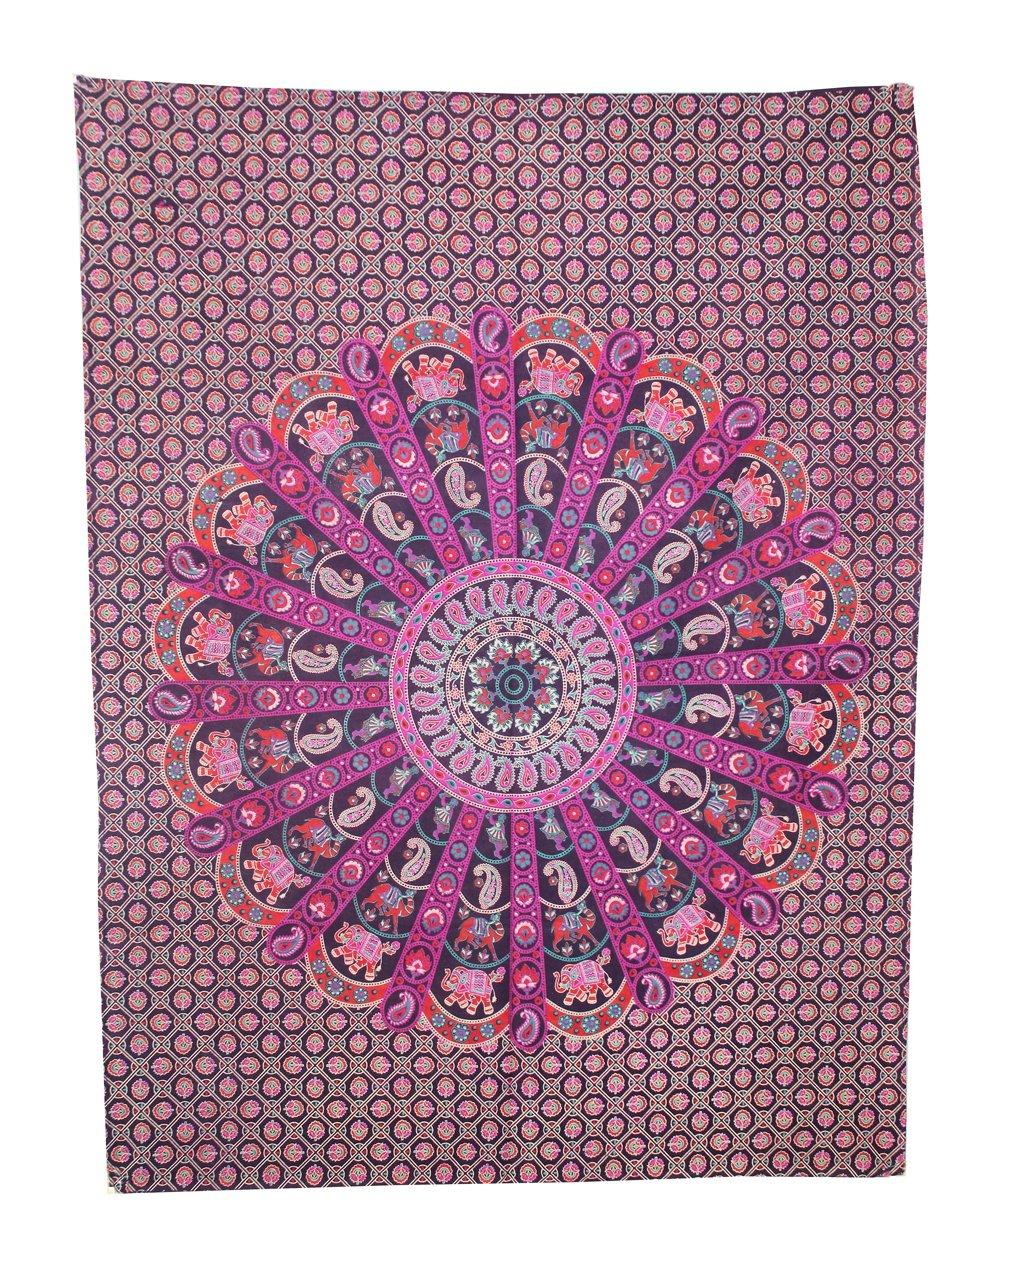 Handmade Art Twin Mandala Tapestry Hippie Wall Hanging Home Decor Wall Art Dorm Size 30x40 Inche.